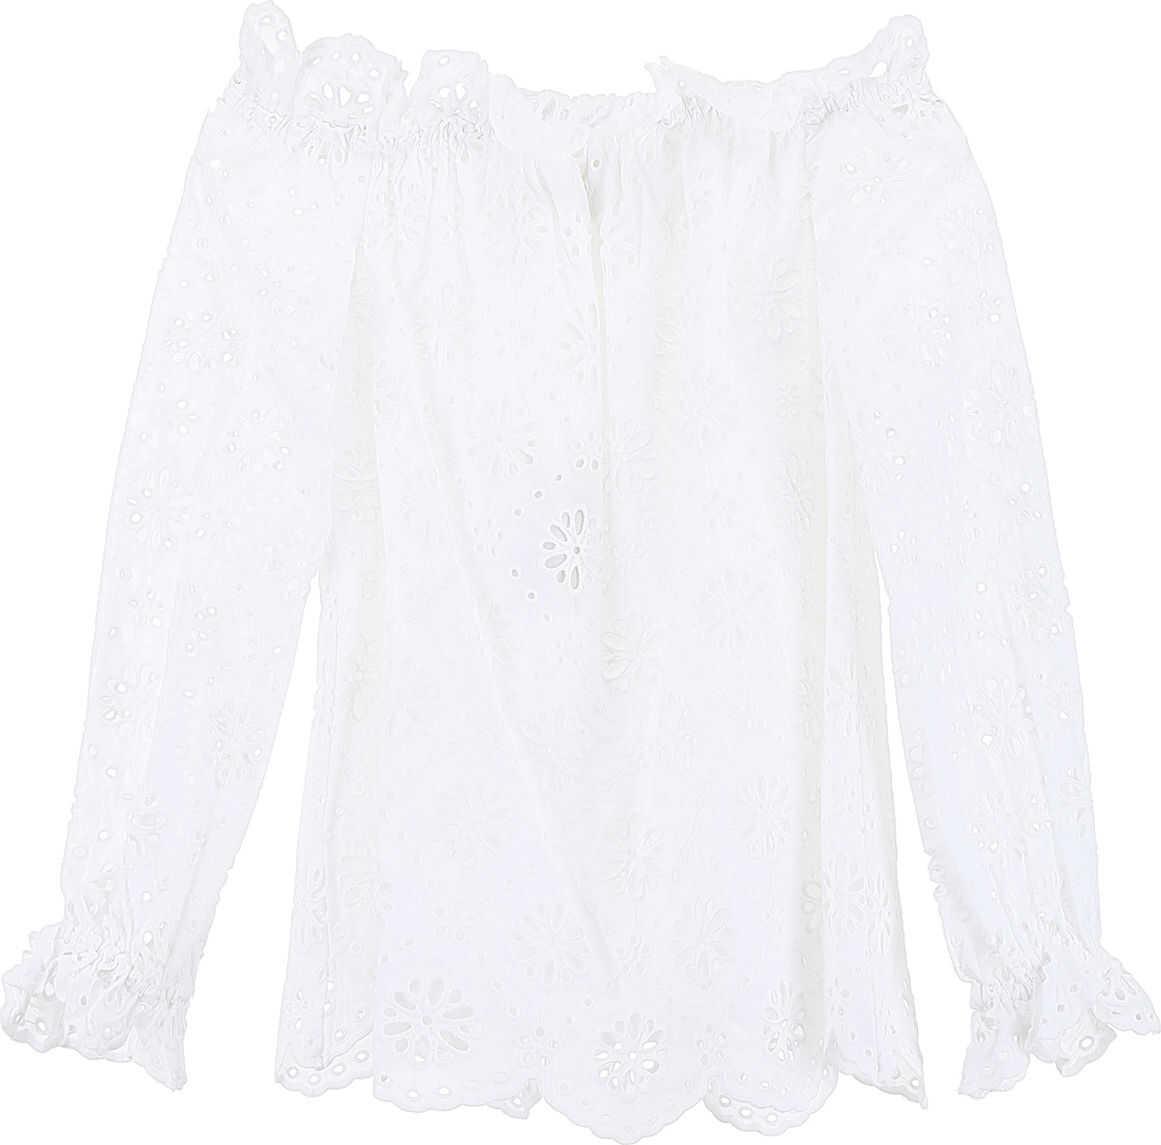 Michael Kors Sangallo Lace Blouse WHITE